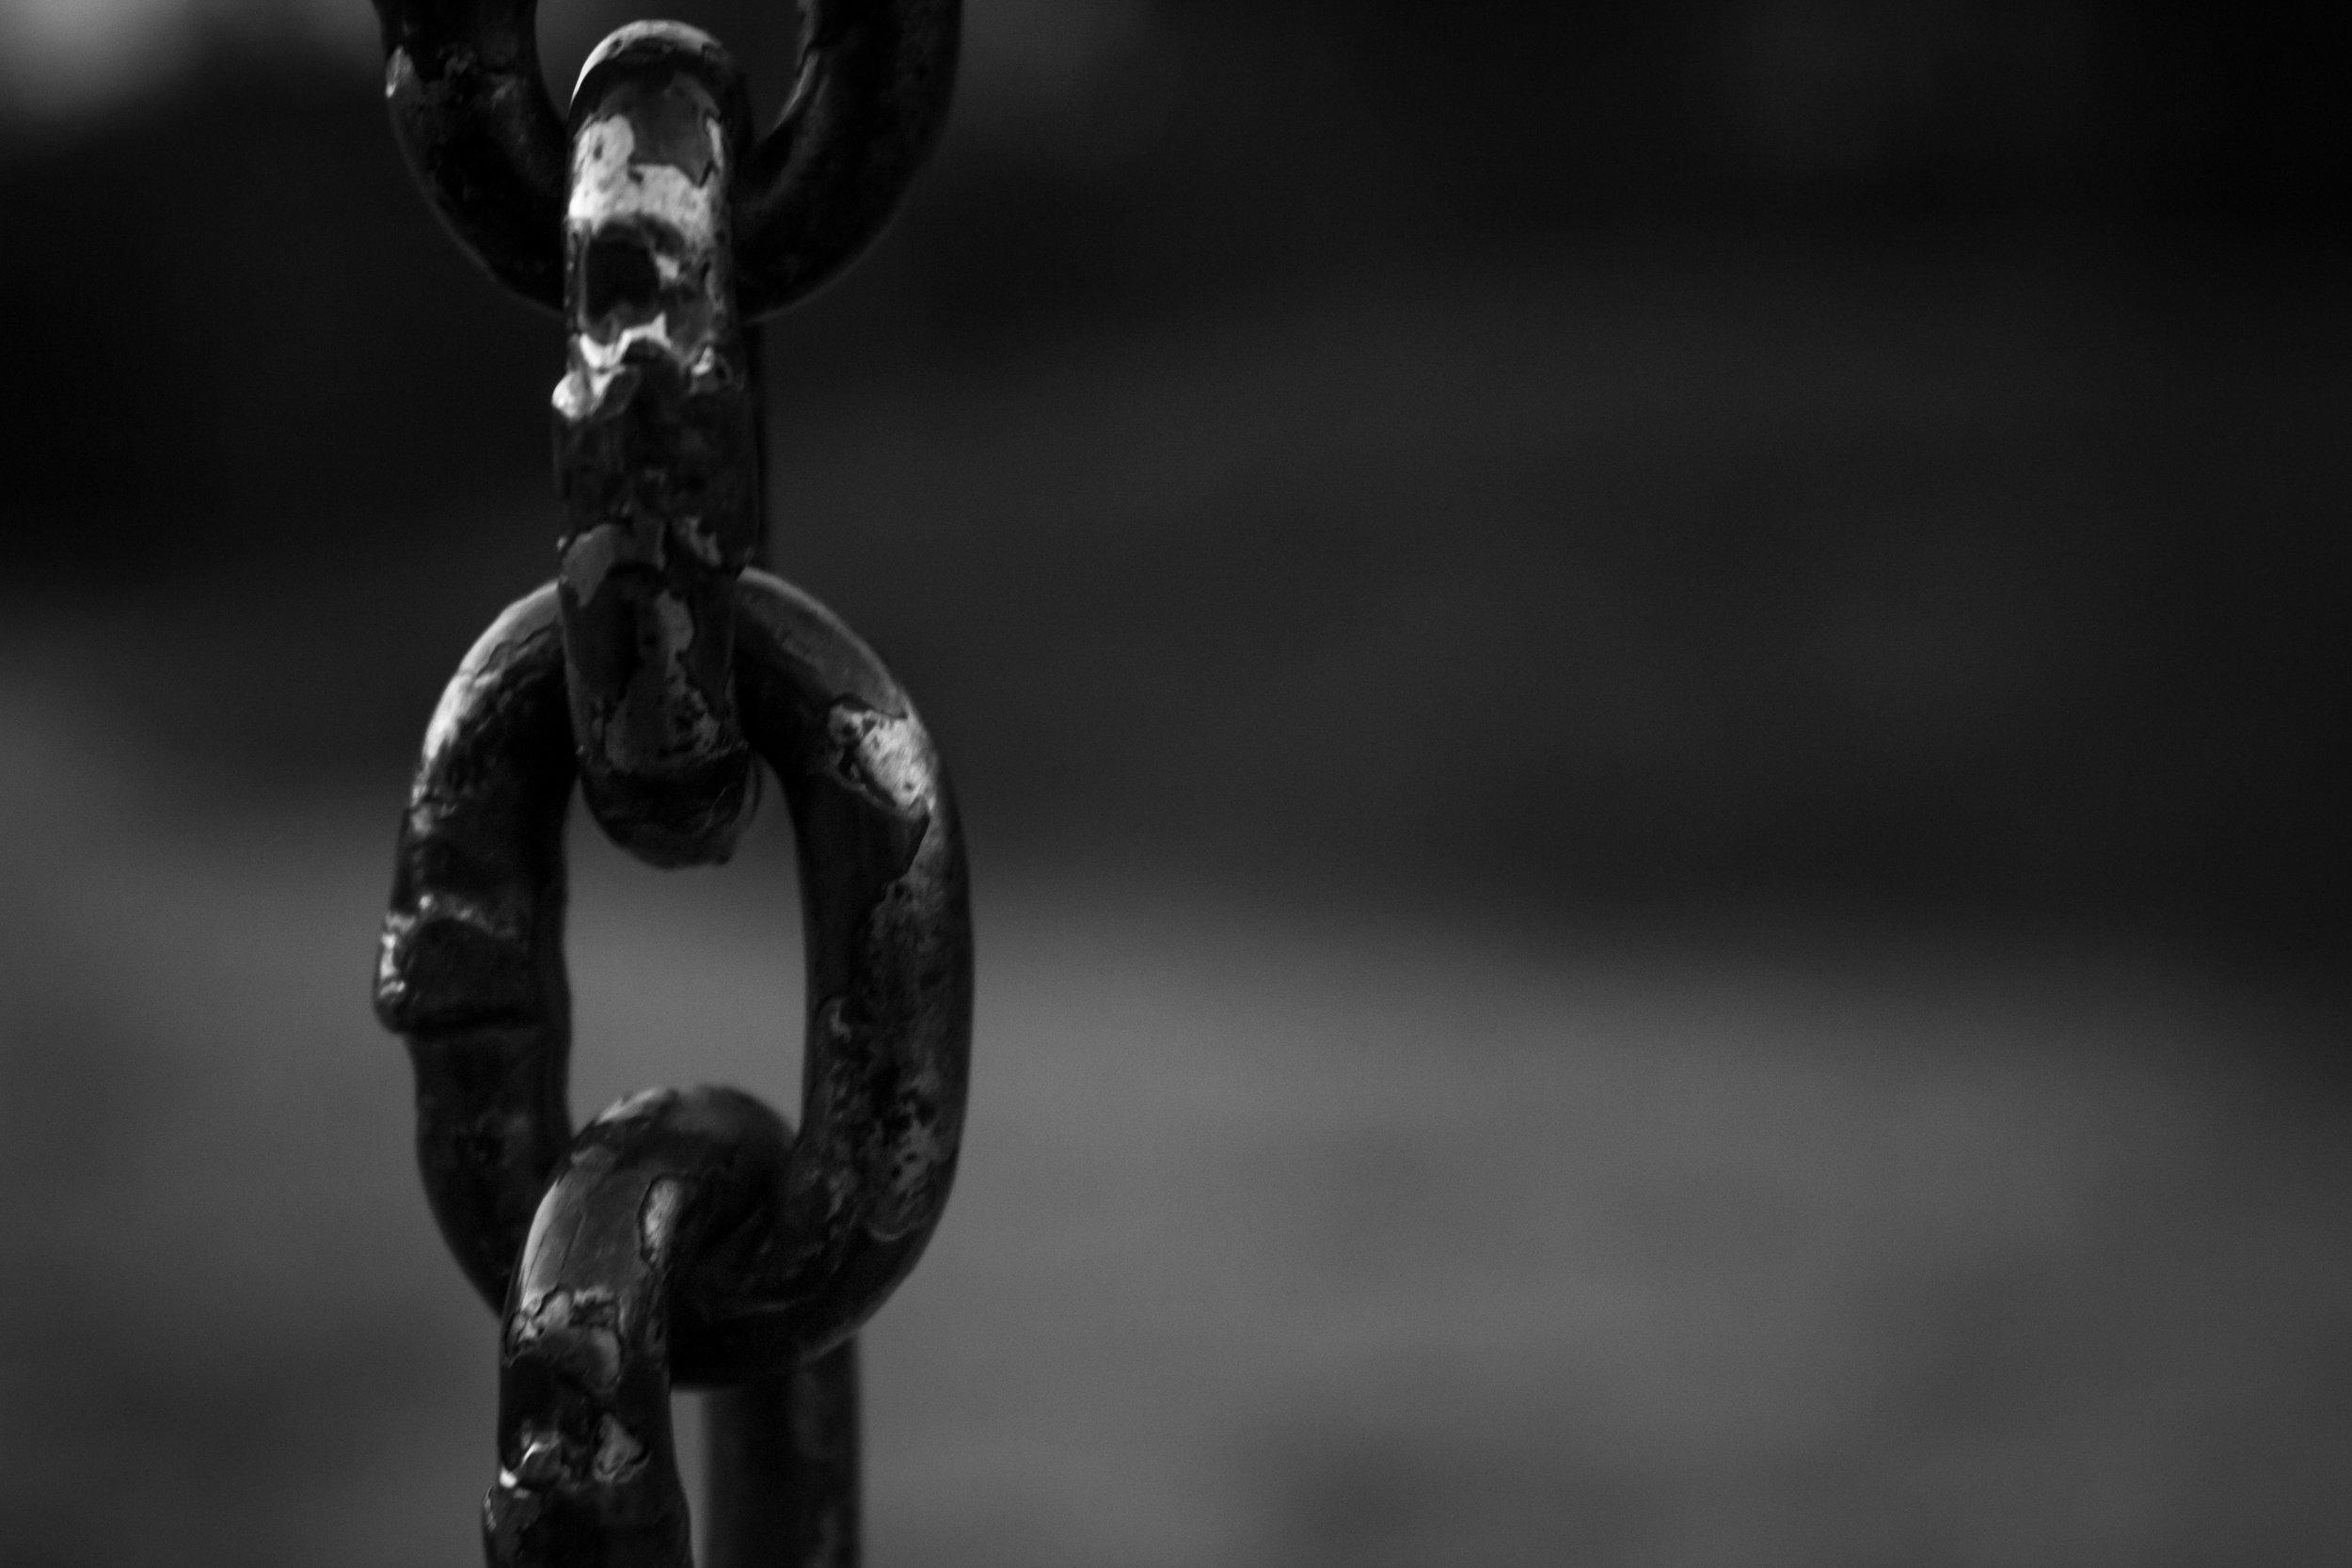 art-black-and-white-blur-147635.jpg